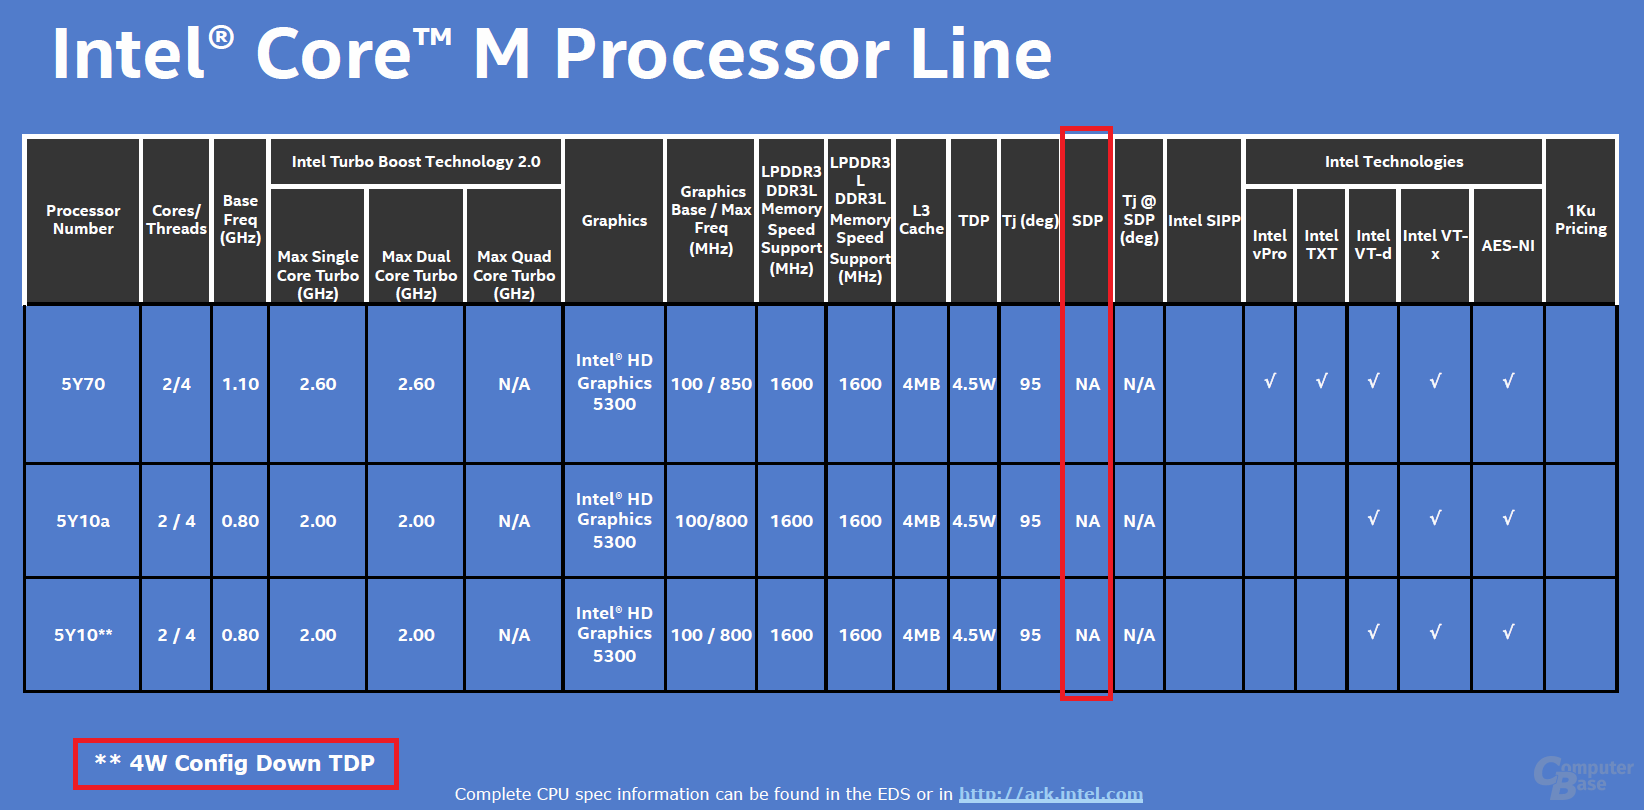 Core M ohne SDP aber mit config TDP